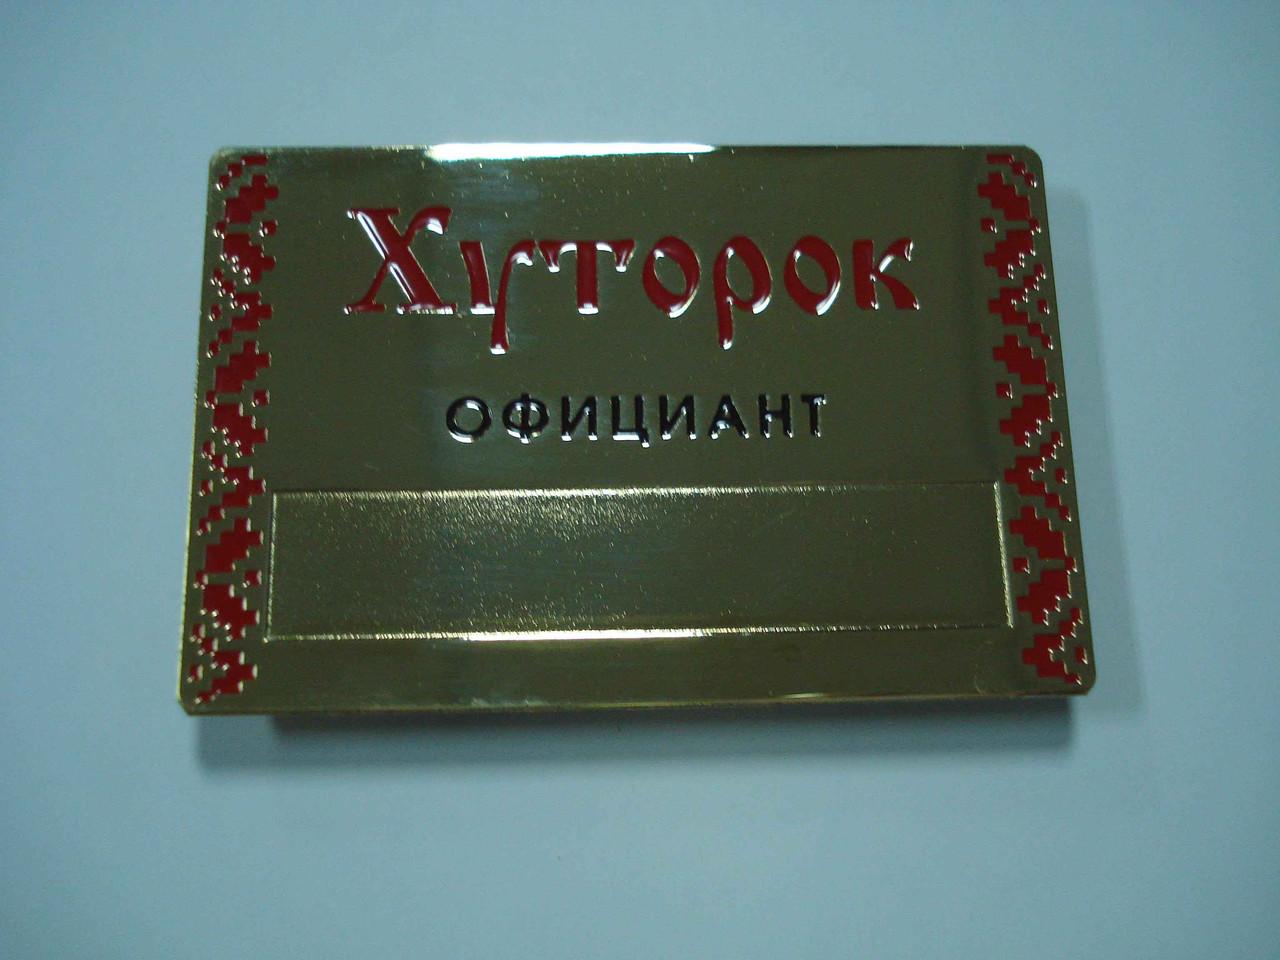 Бейдж металл под вклейку имени, золото